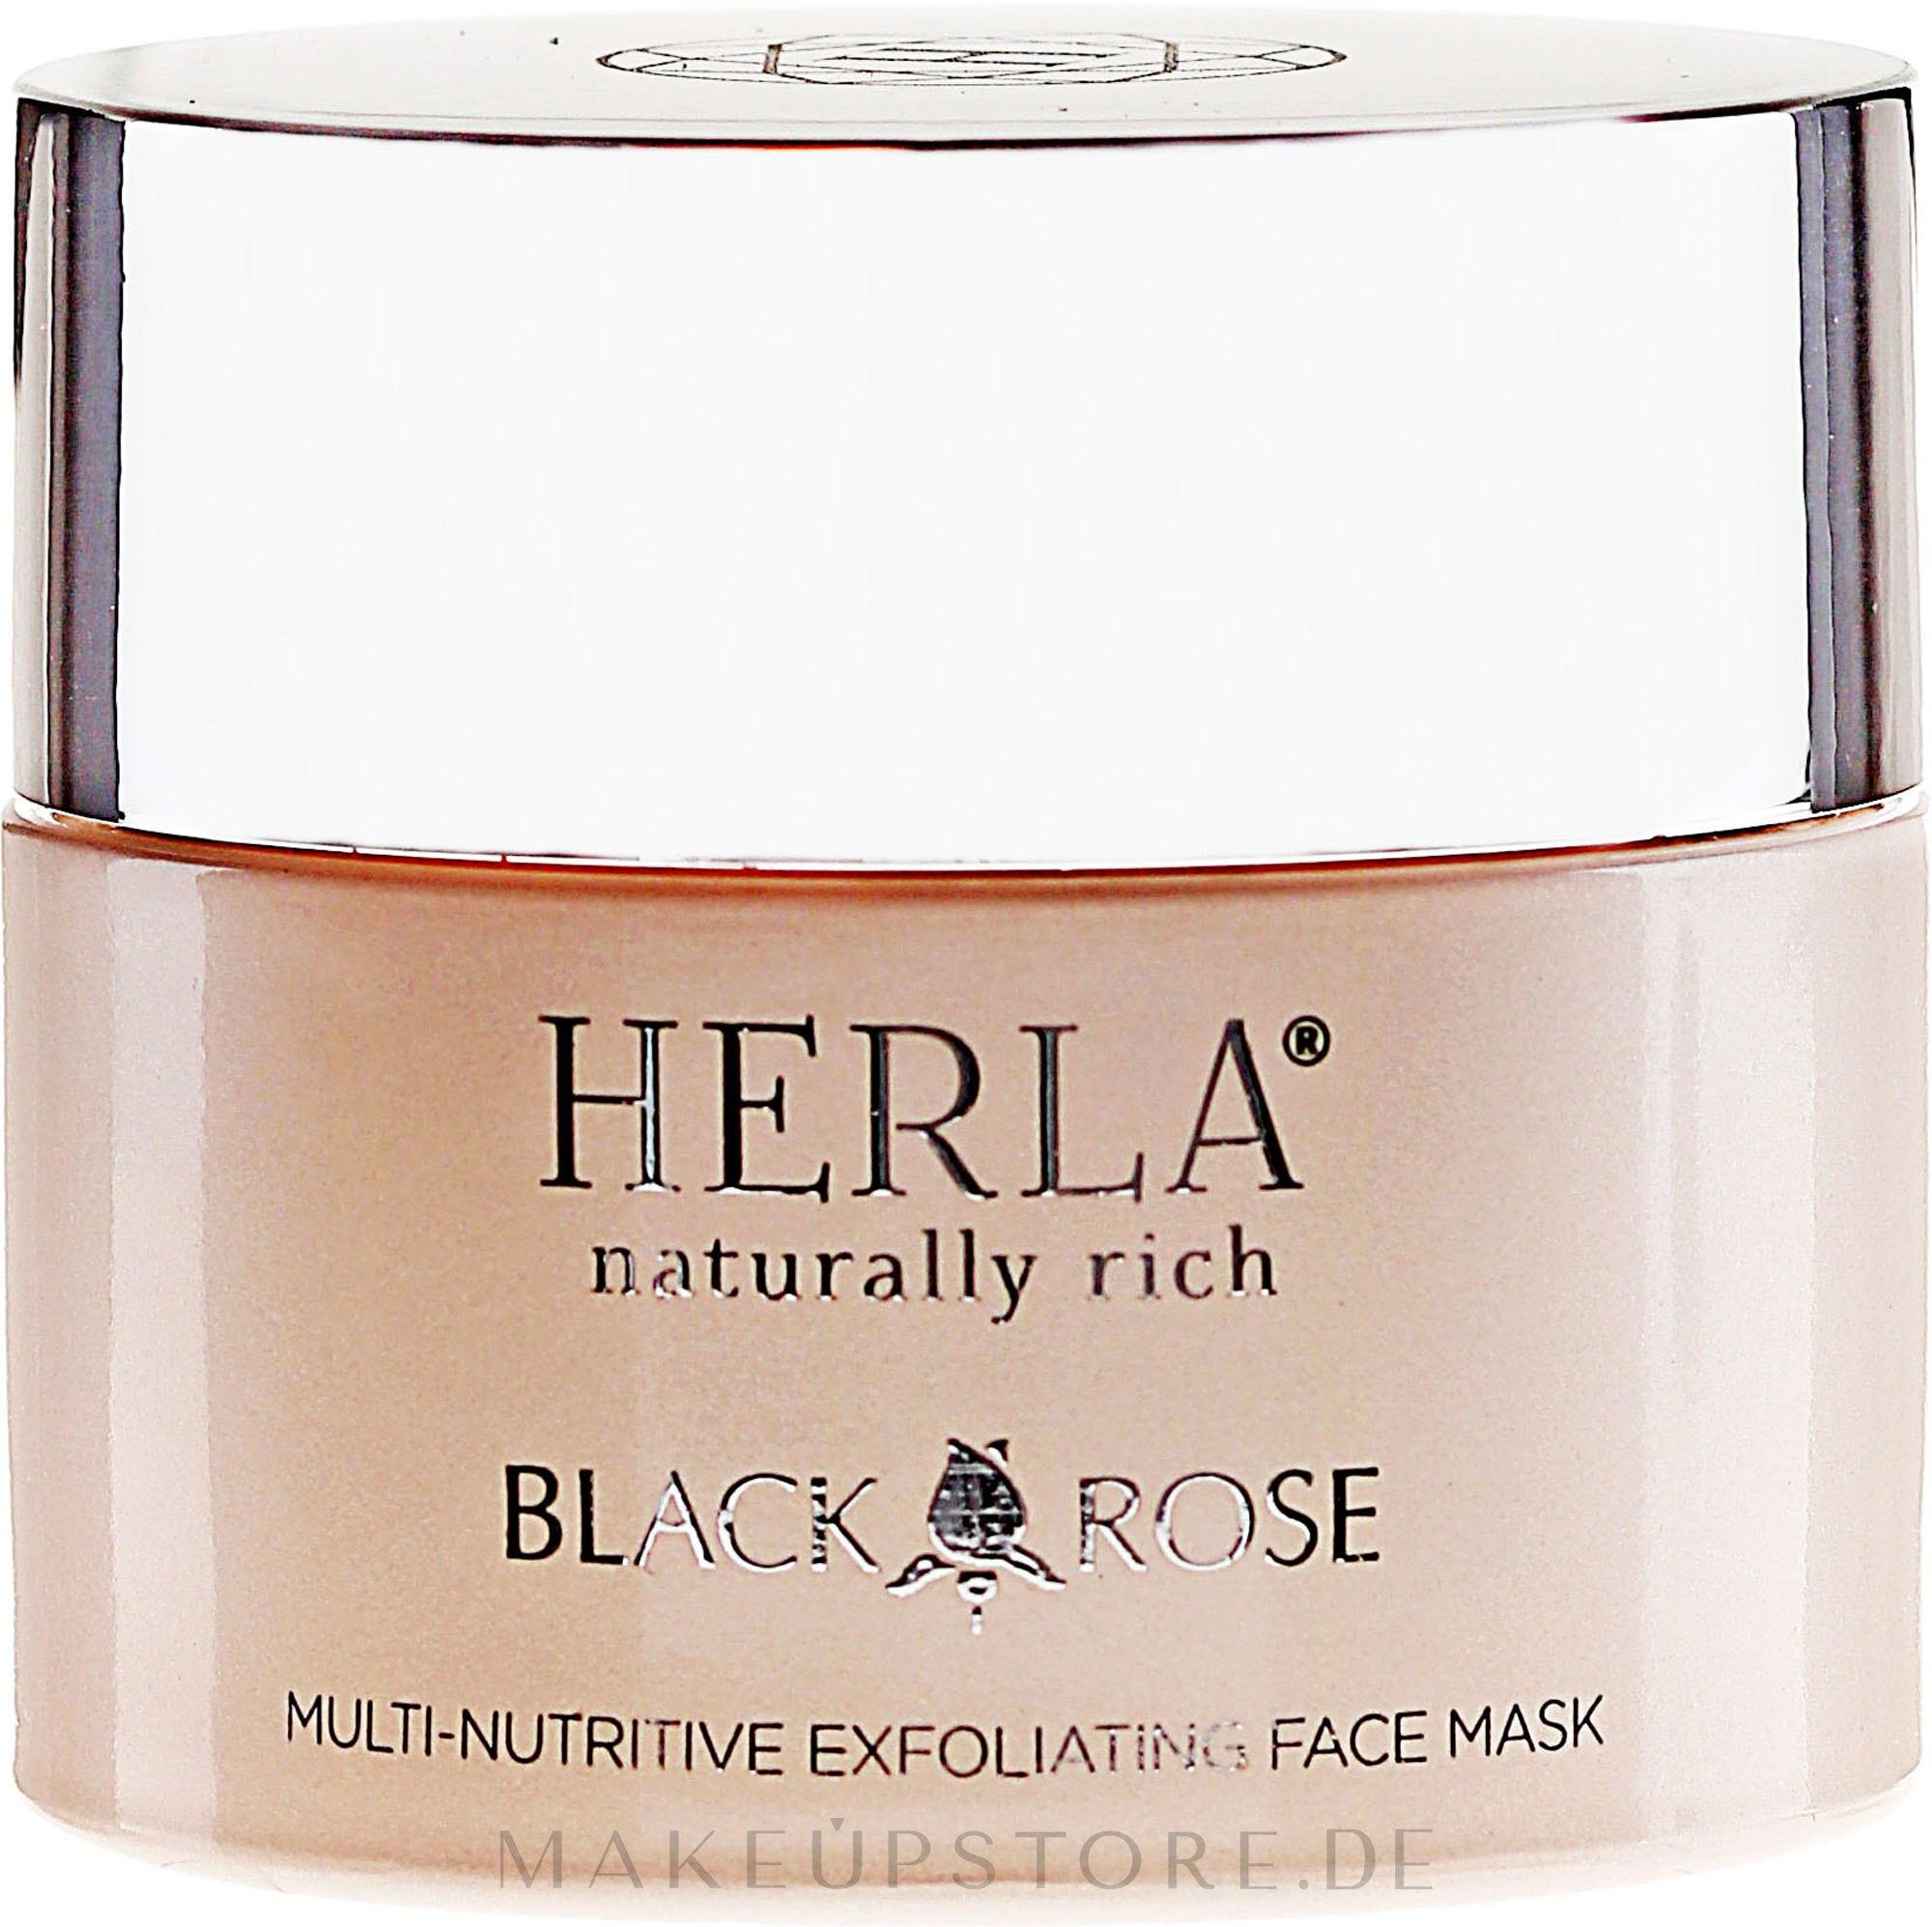 Tonisierende Peelingmaske für das Gesicht - Herla Black Rose Multi-Nutritive Exfoliating Face Mask — Bild 50 ml